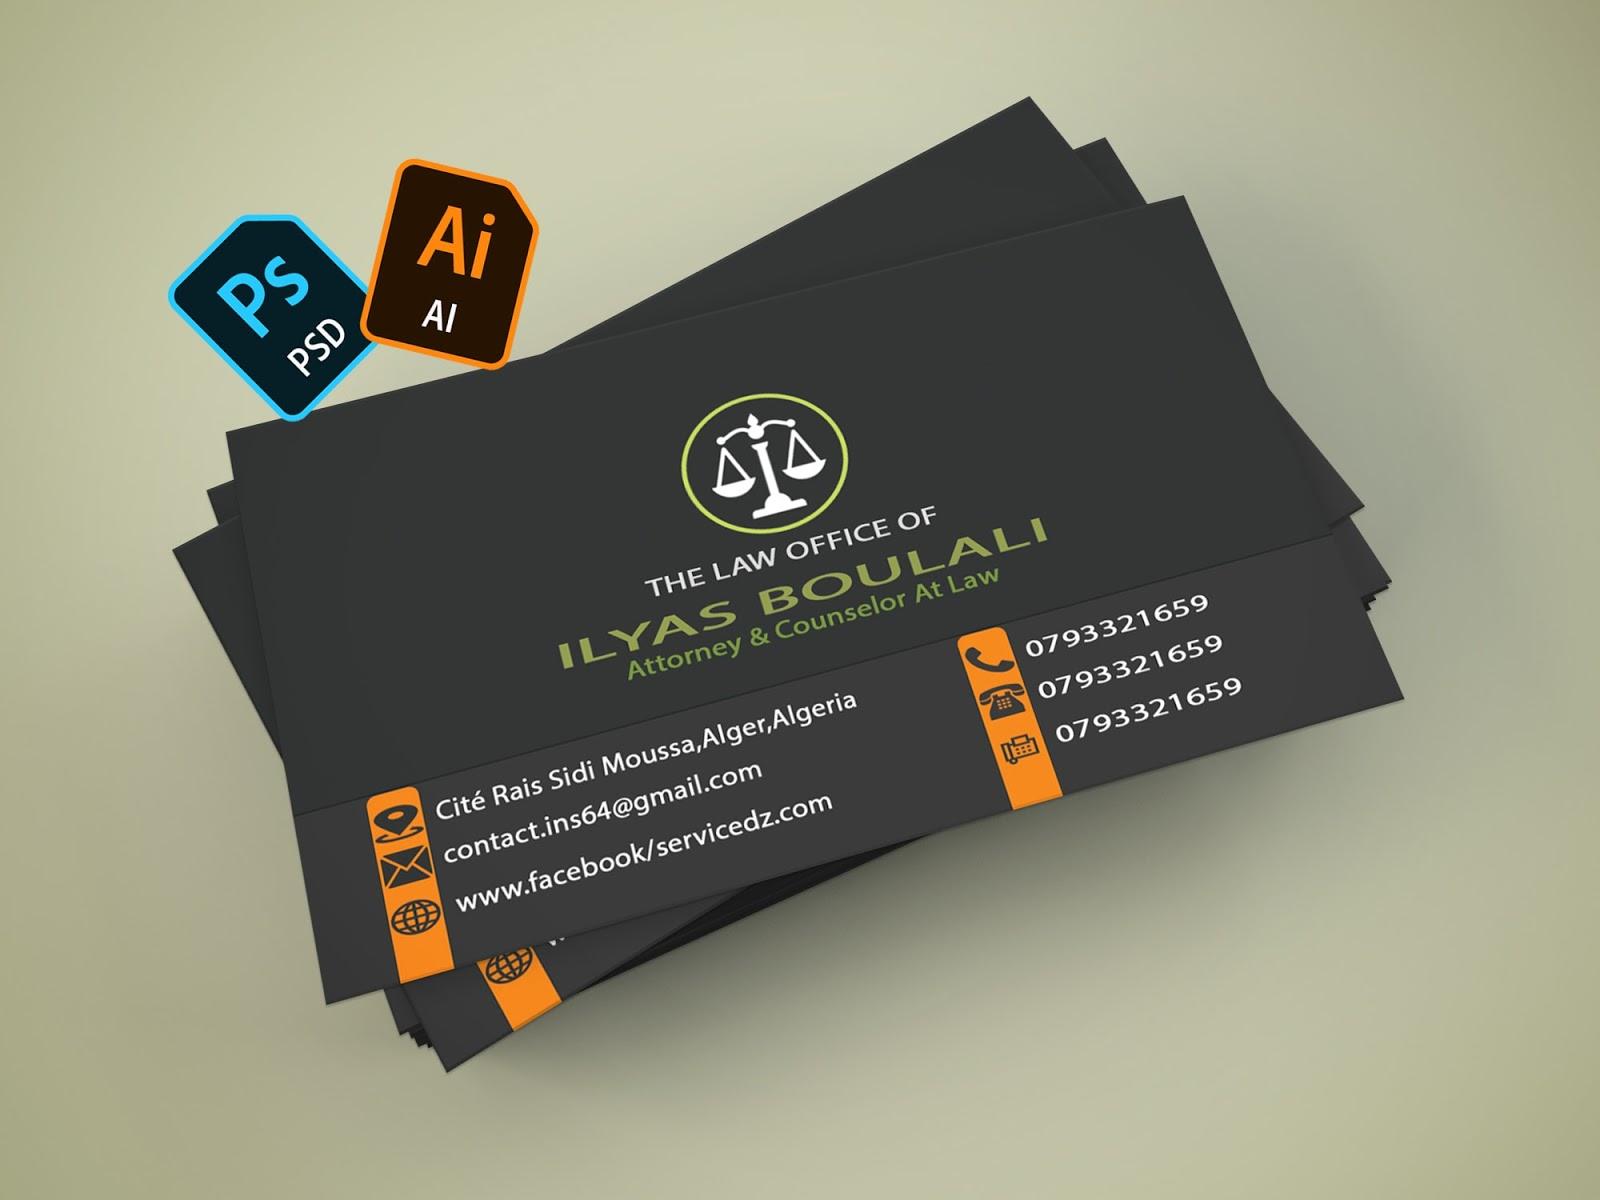 carte de visite- بطاقة أعمال- BUSINESS CARD- CARTE VISITE- كرت شخصي-